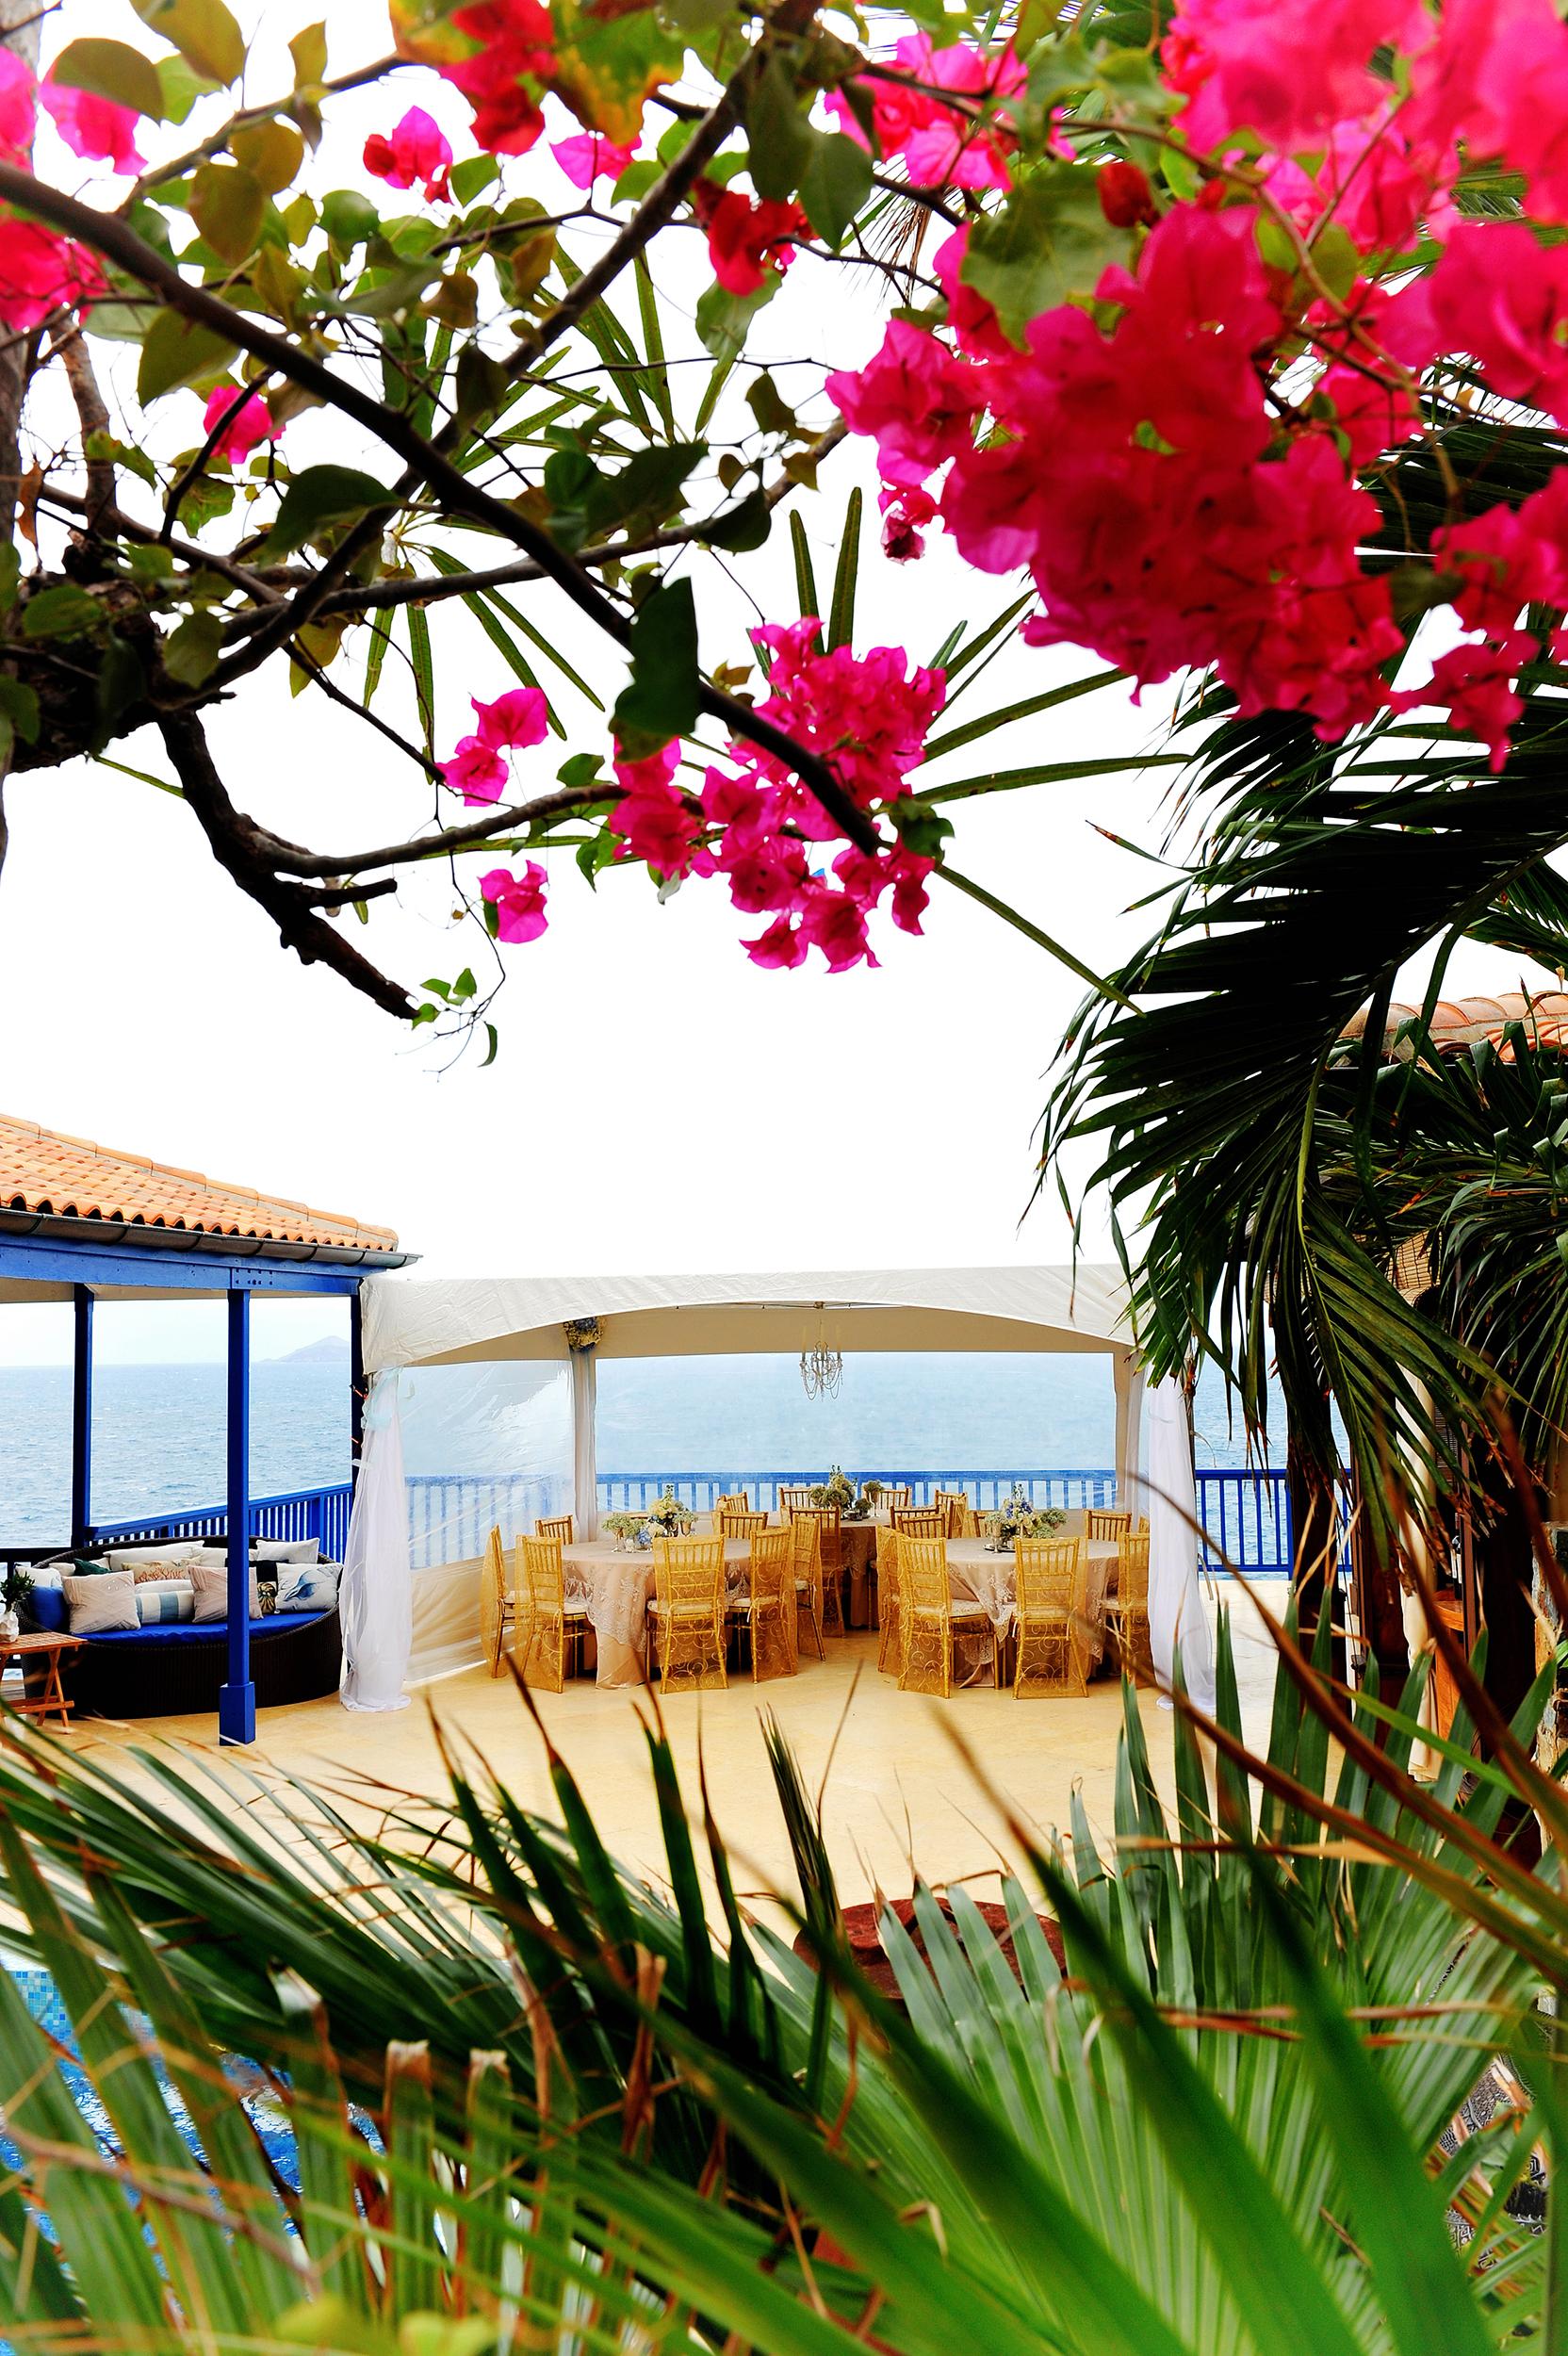 Best Corporate Venue on St. Thomas - Virgin Islands Events